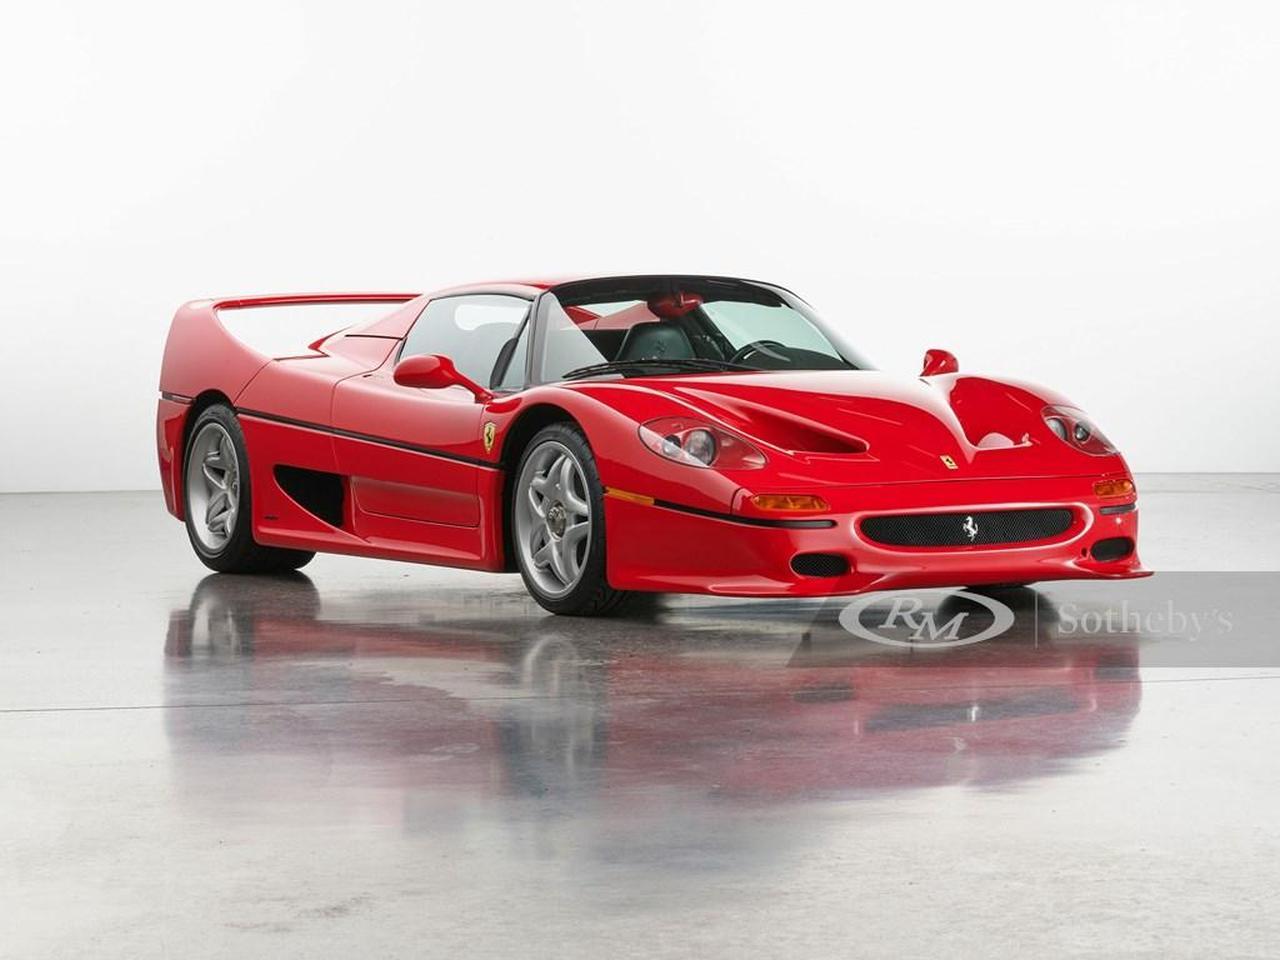 Ferrari F50-RM-Sothebys-2021-auction-1